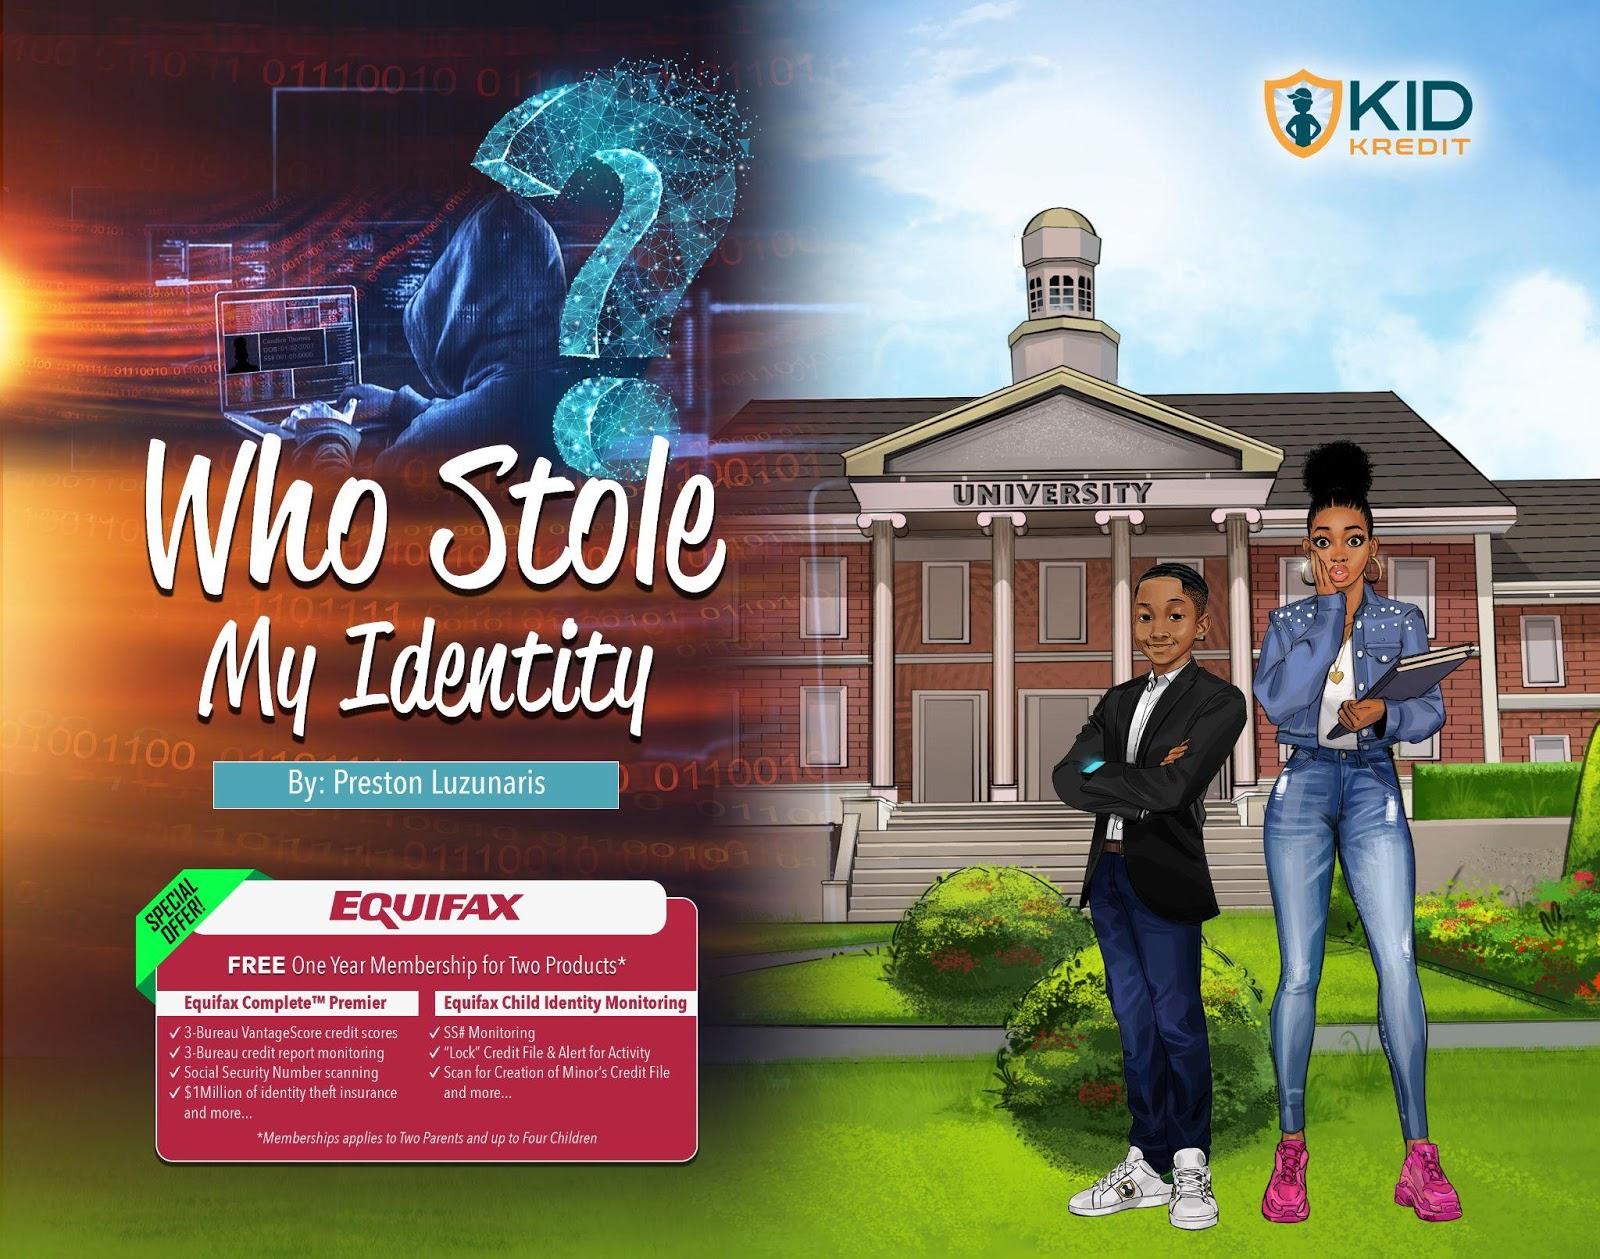 'Kid Kredit' Inks Multimillion-dollar Partnership To Battle Child Identity Theft